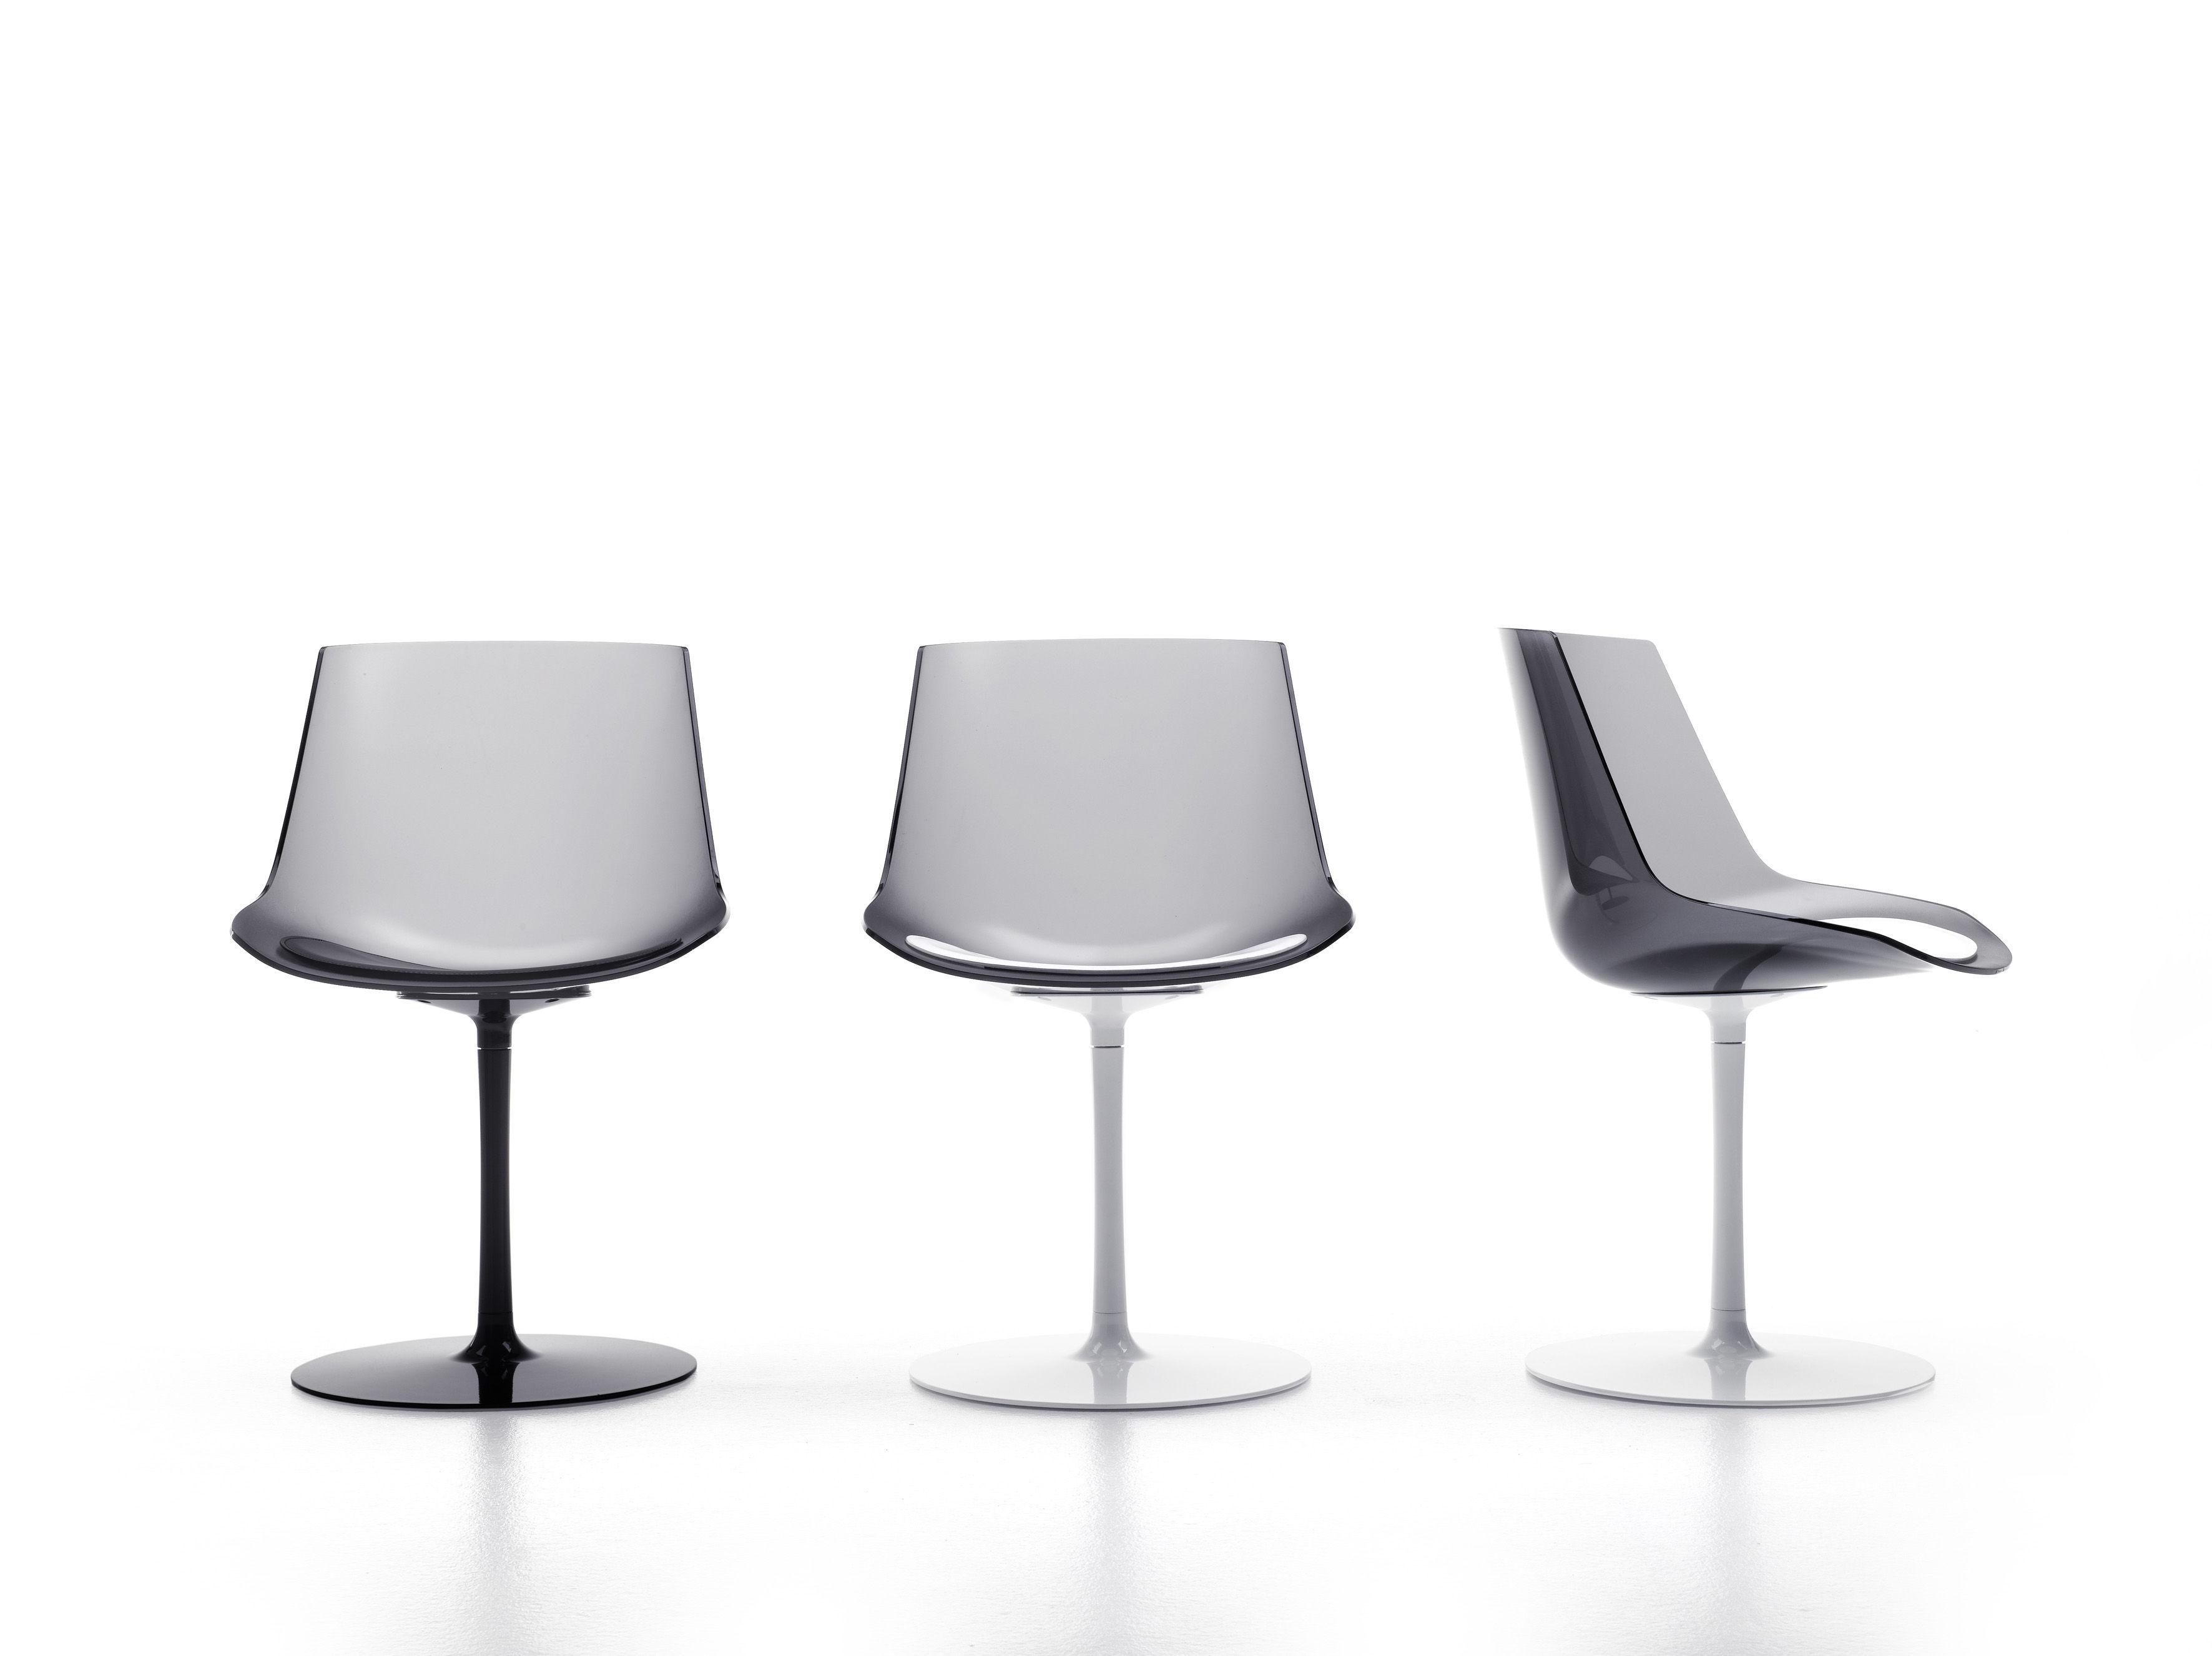 chaise pivotante flow pied central fum pied blanc mdf italia. Black Bedroom Furniture Sets. Home Design Ideas